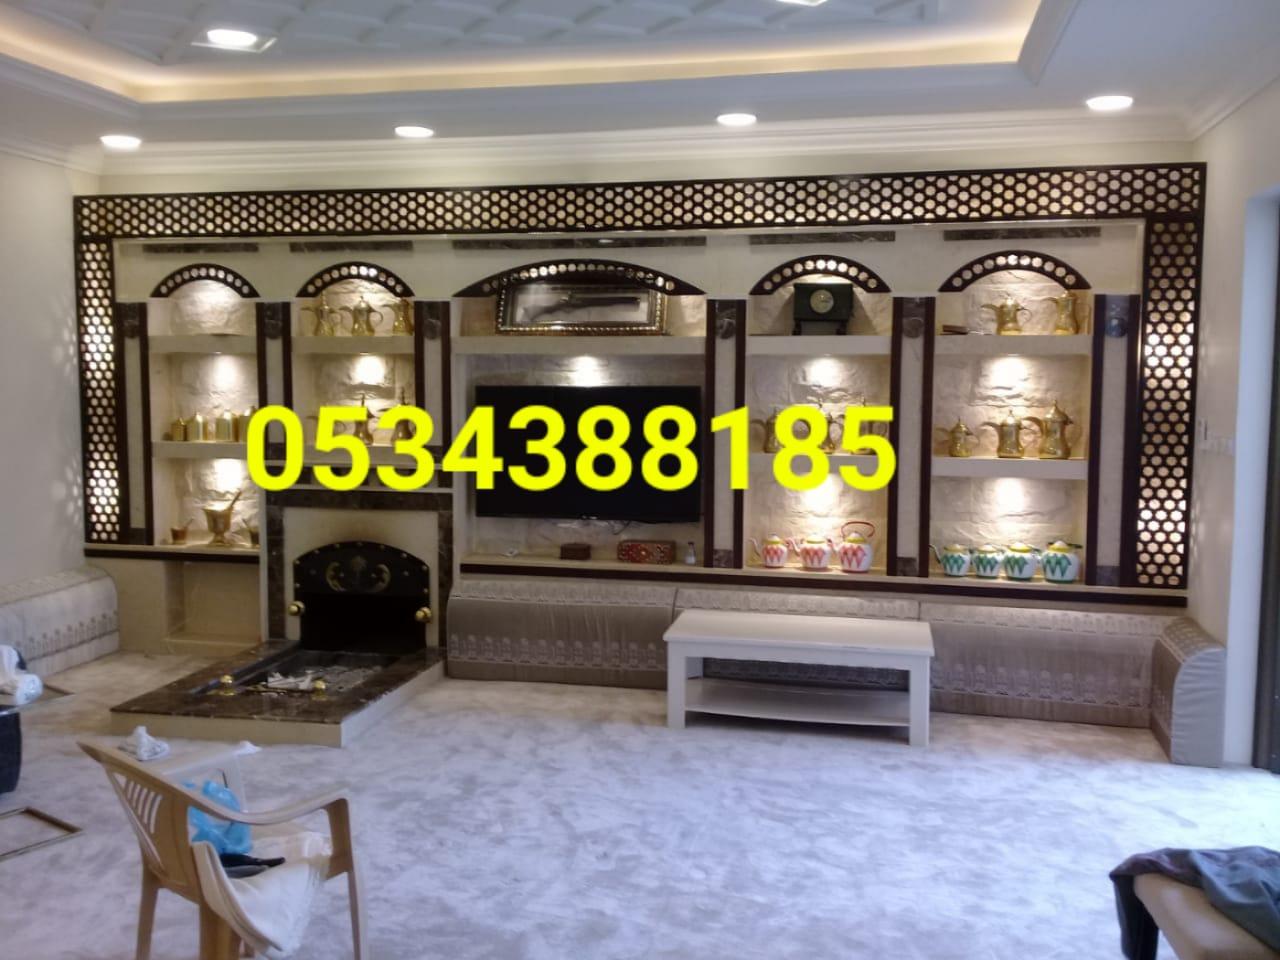 0534388185 ديكورات p_16364cq7h6.jpg